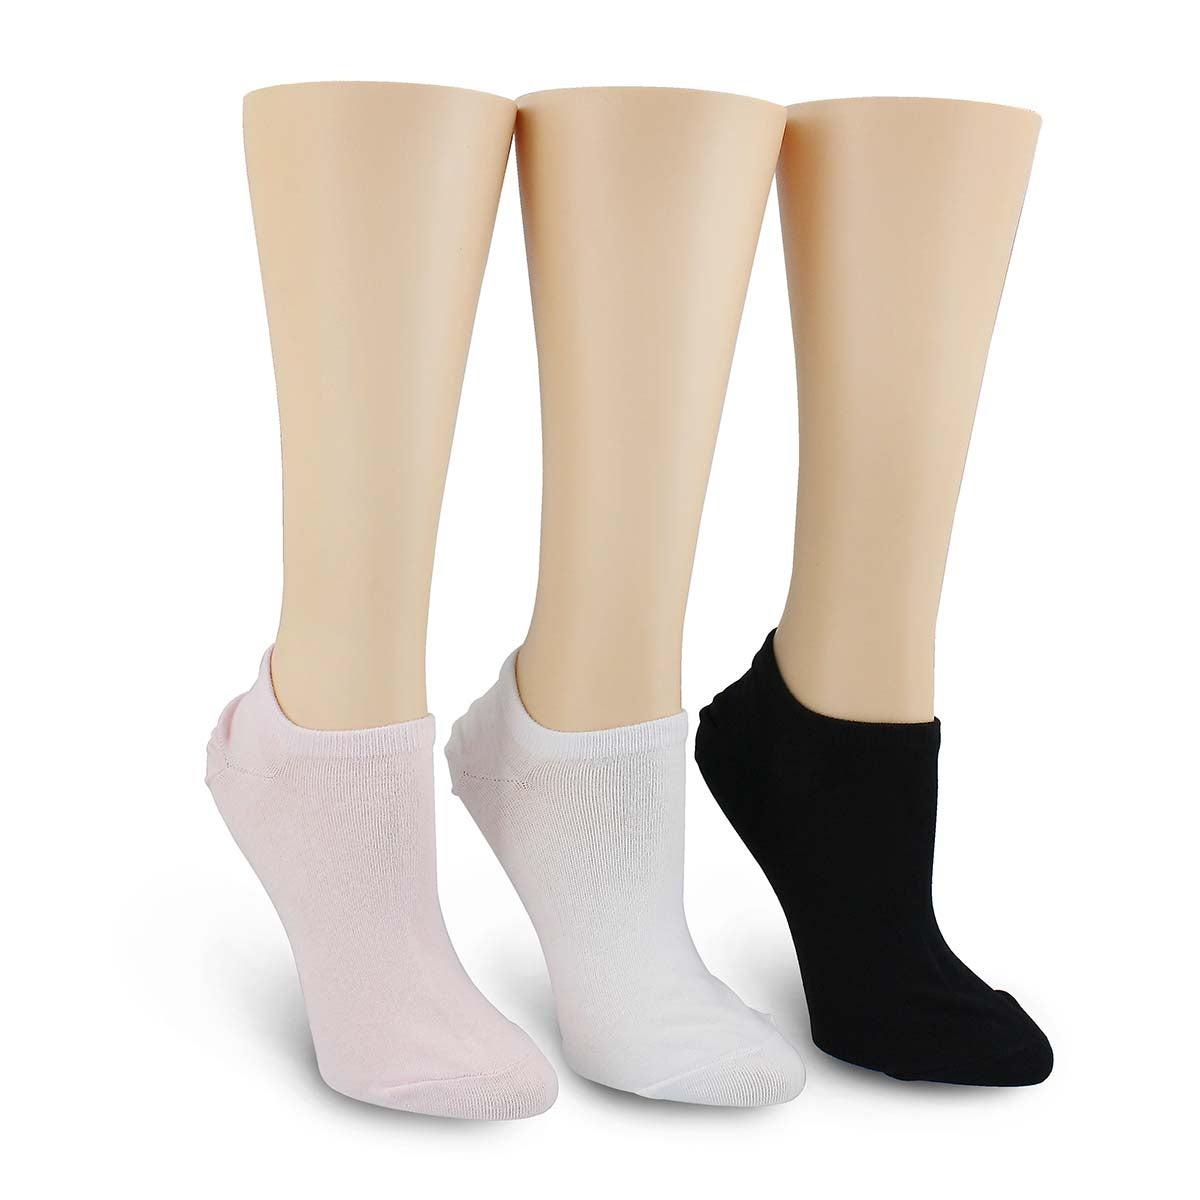 Socquettes CONVERSE, multi, 3 p, femmes